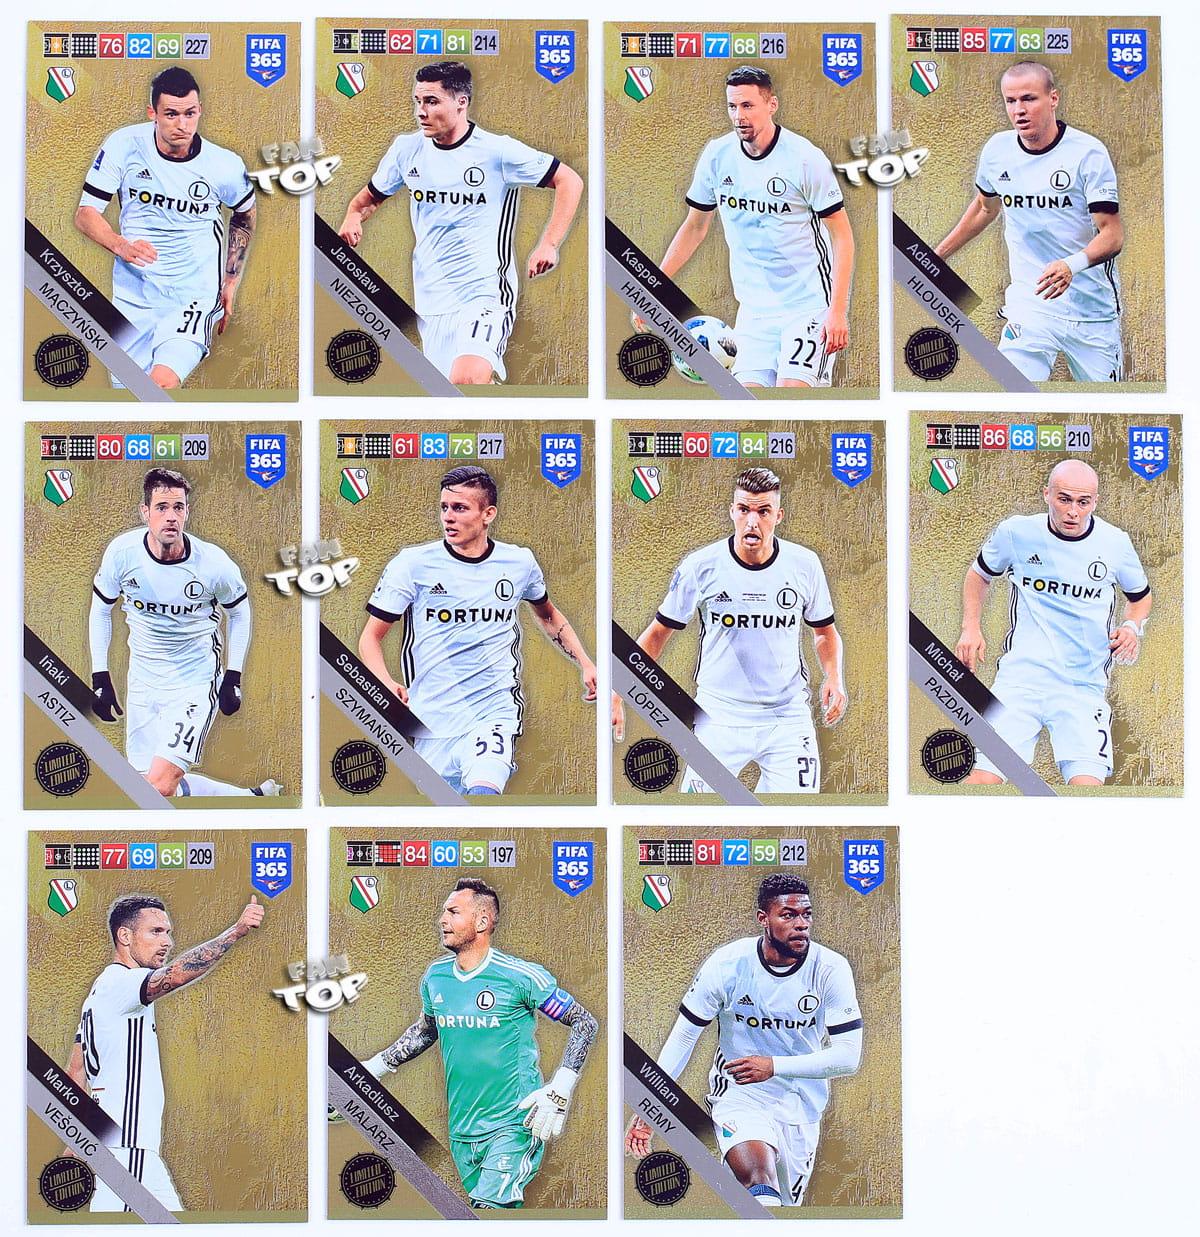 7687a1a2d 01 LIMITED EDITION wybór kart - FIFA 2019 fantop.pl